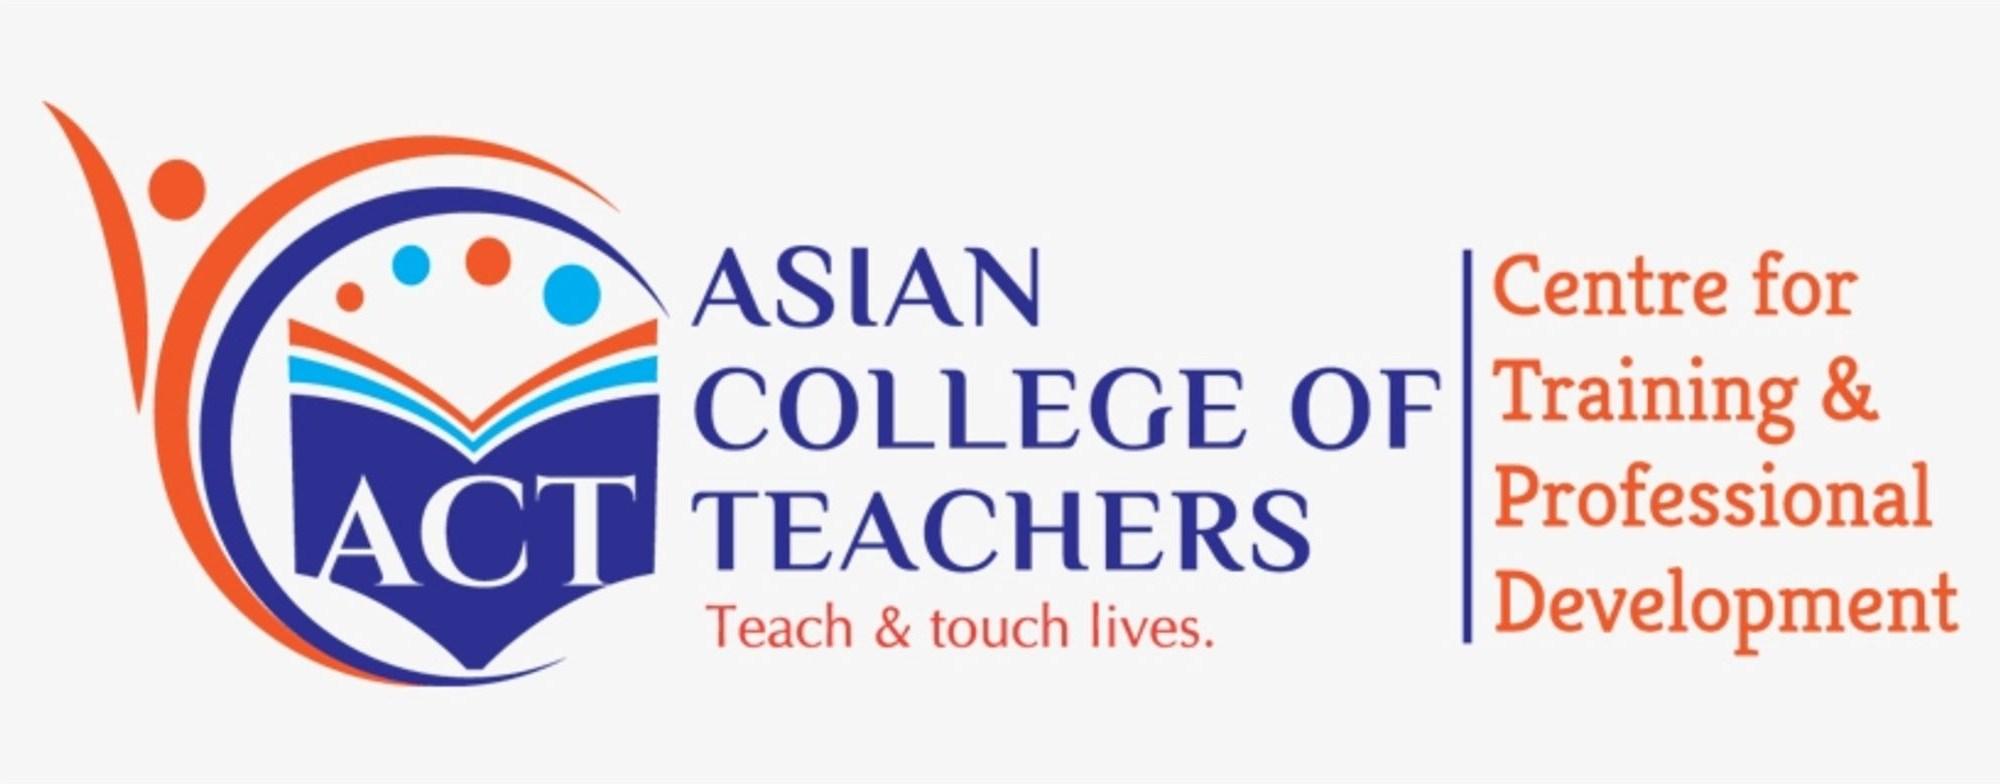 Is The Asian College of Teachers Legit?